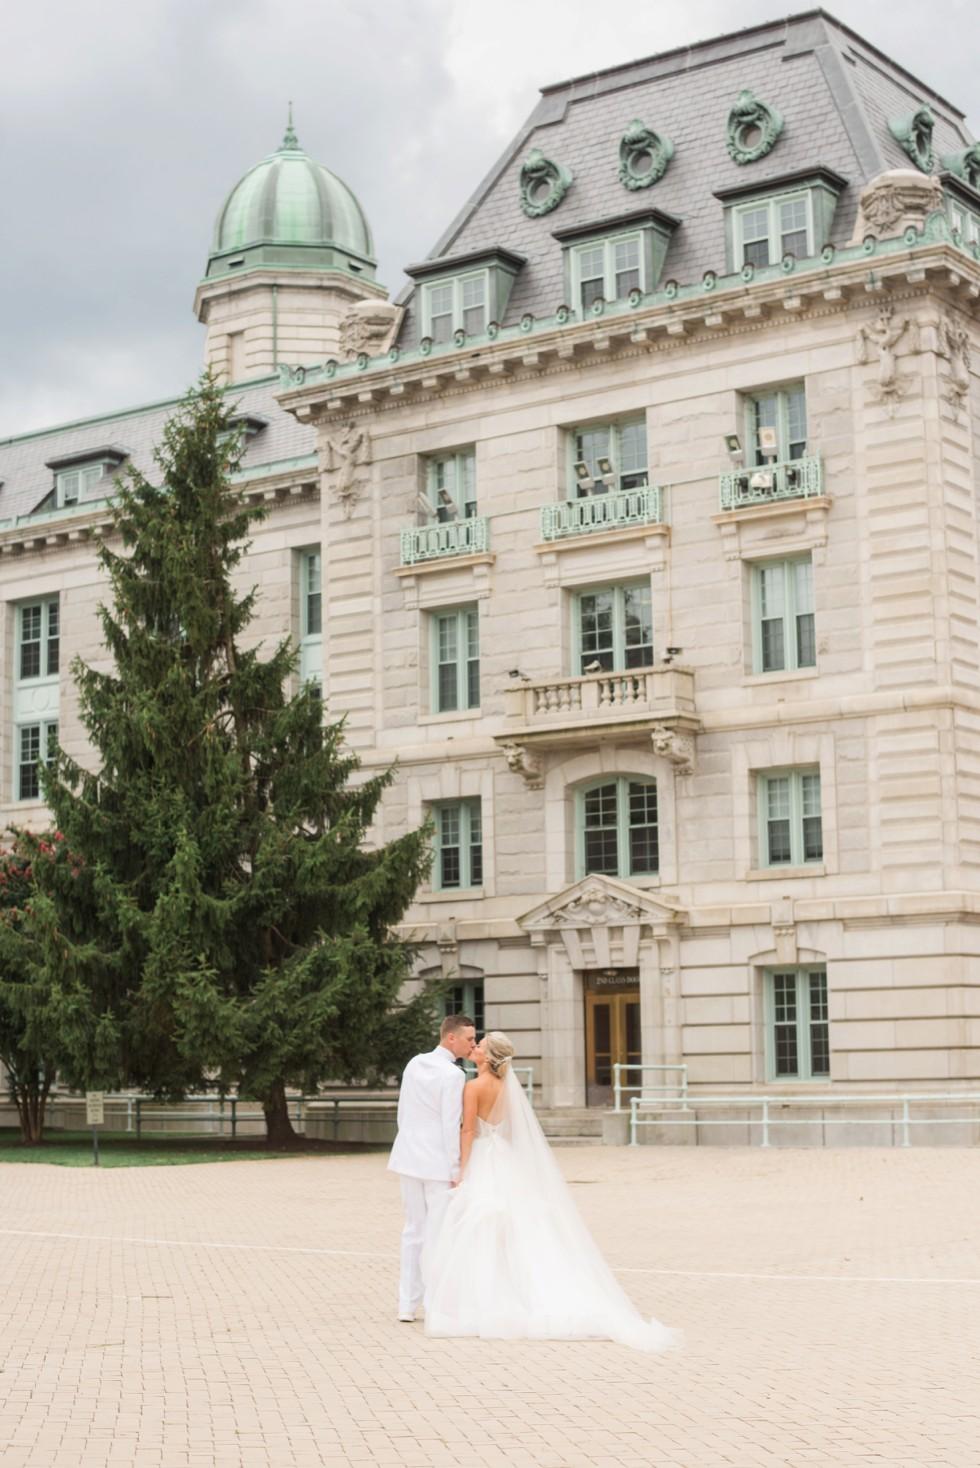 Bancroft Hall bride and groom photos